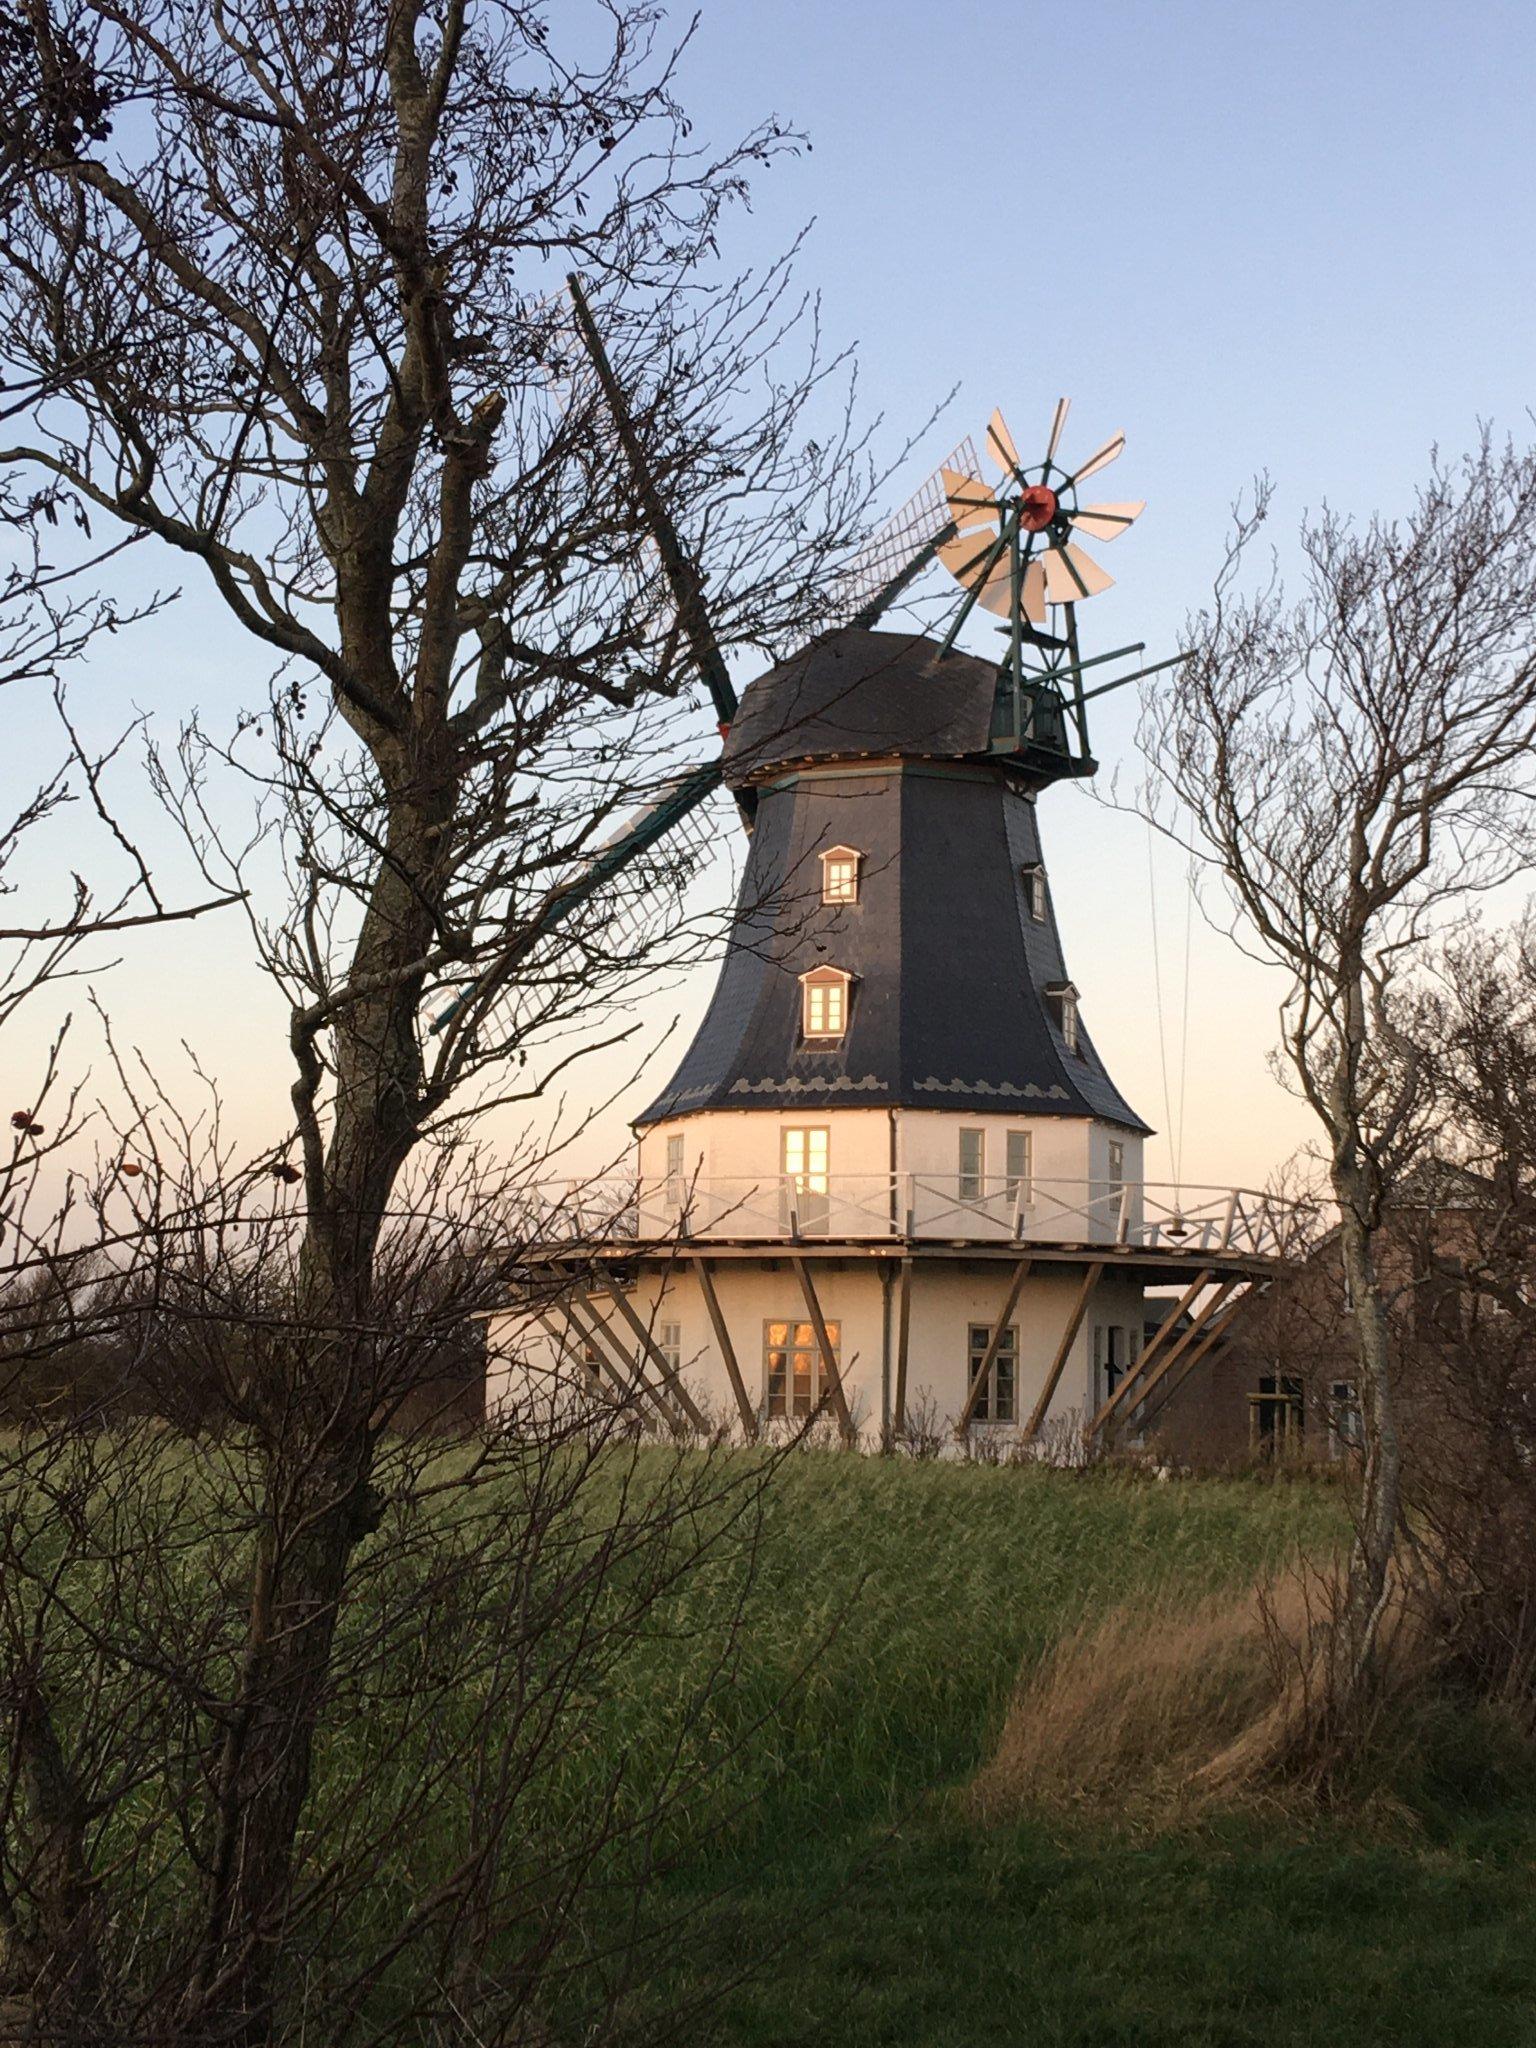 Lembecks Burg bei Borgsum